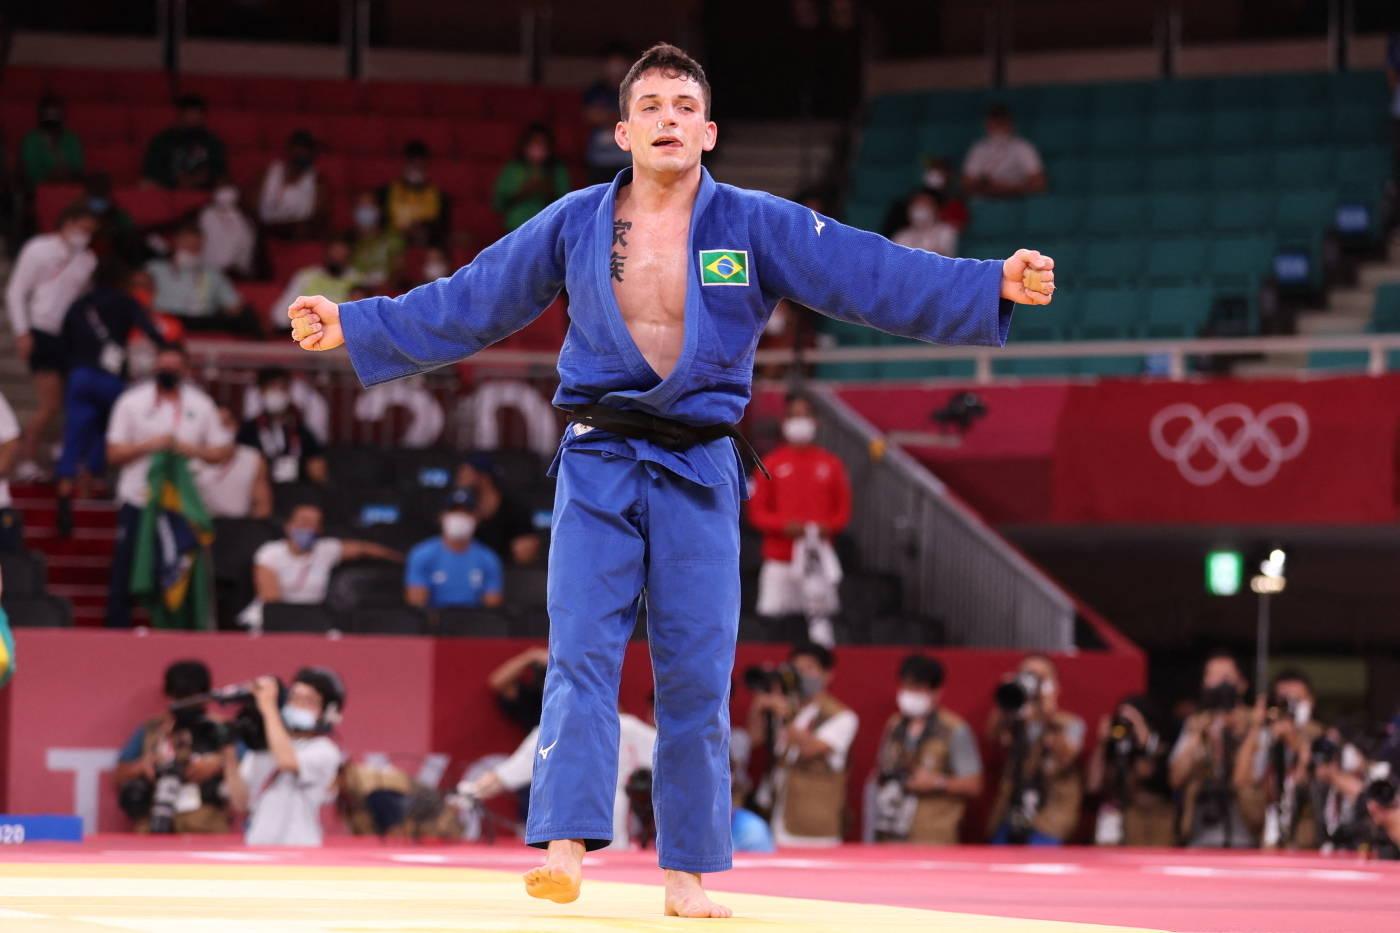 Cargnin venceu o israelense Baruch Shmailov e ganhou o bronze na Olimpíada